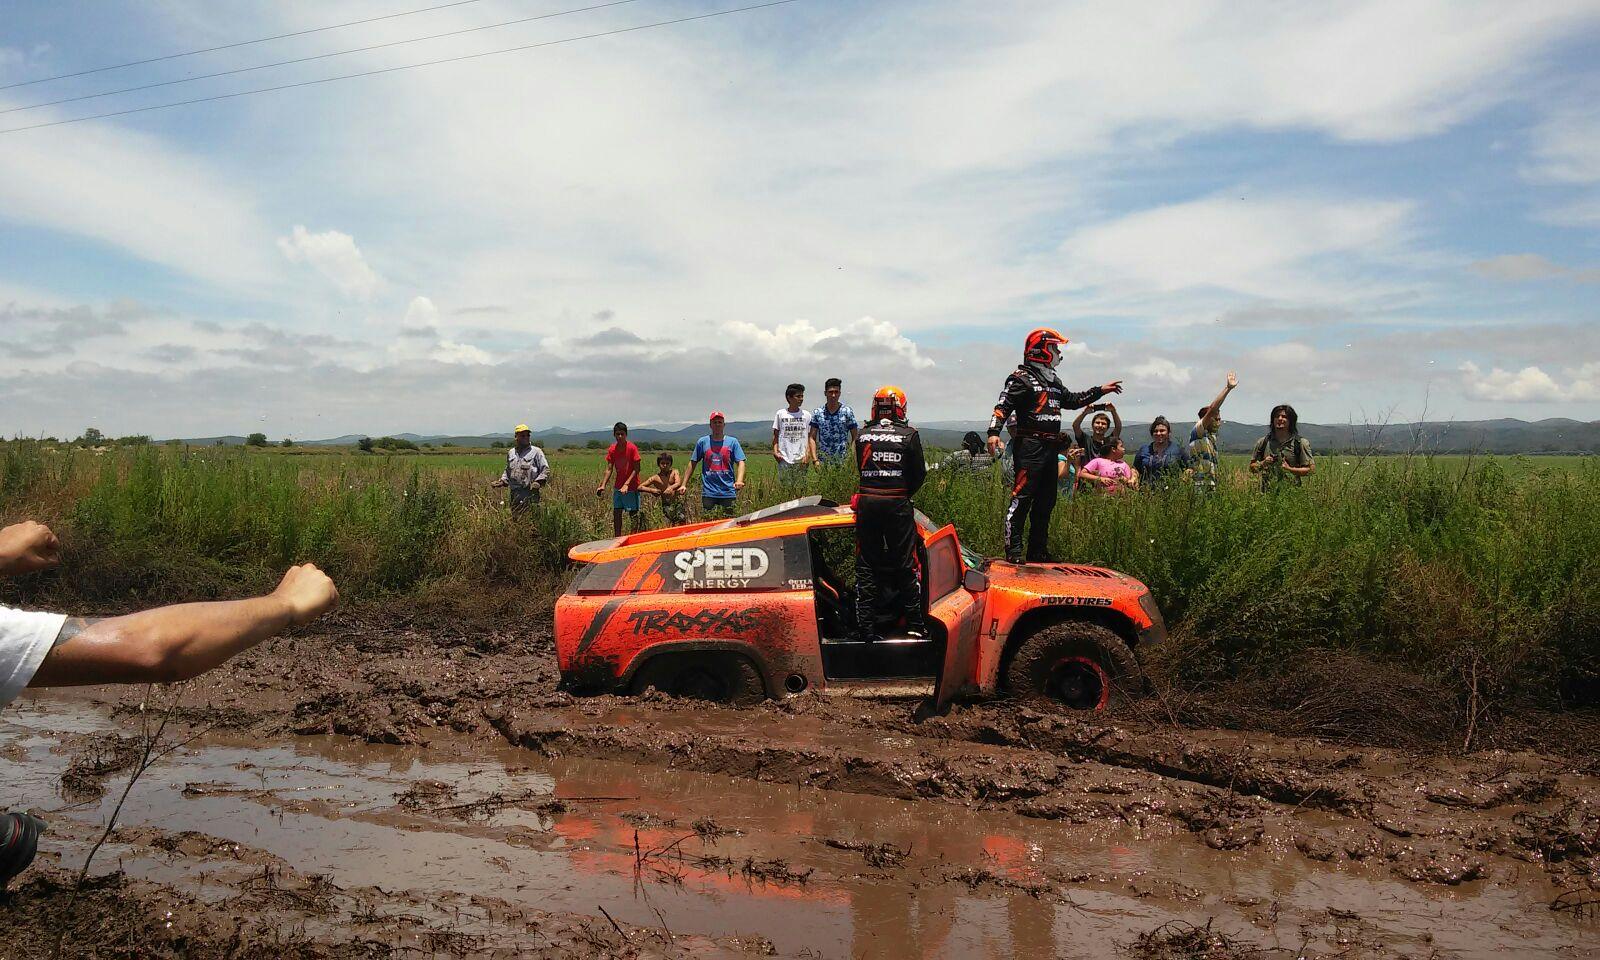 2016 Rallye Raid Dakar Argentina - Bolivia [3-16 Enero] - Página 6 CX45_CaWsAAtNkD